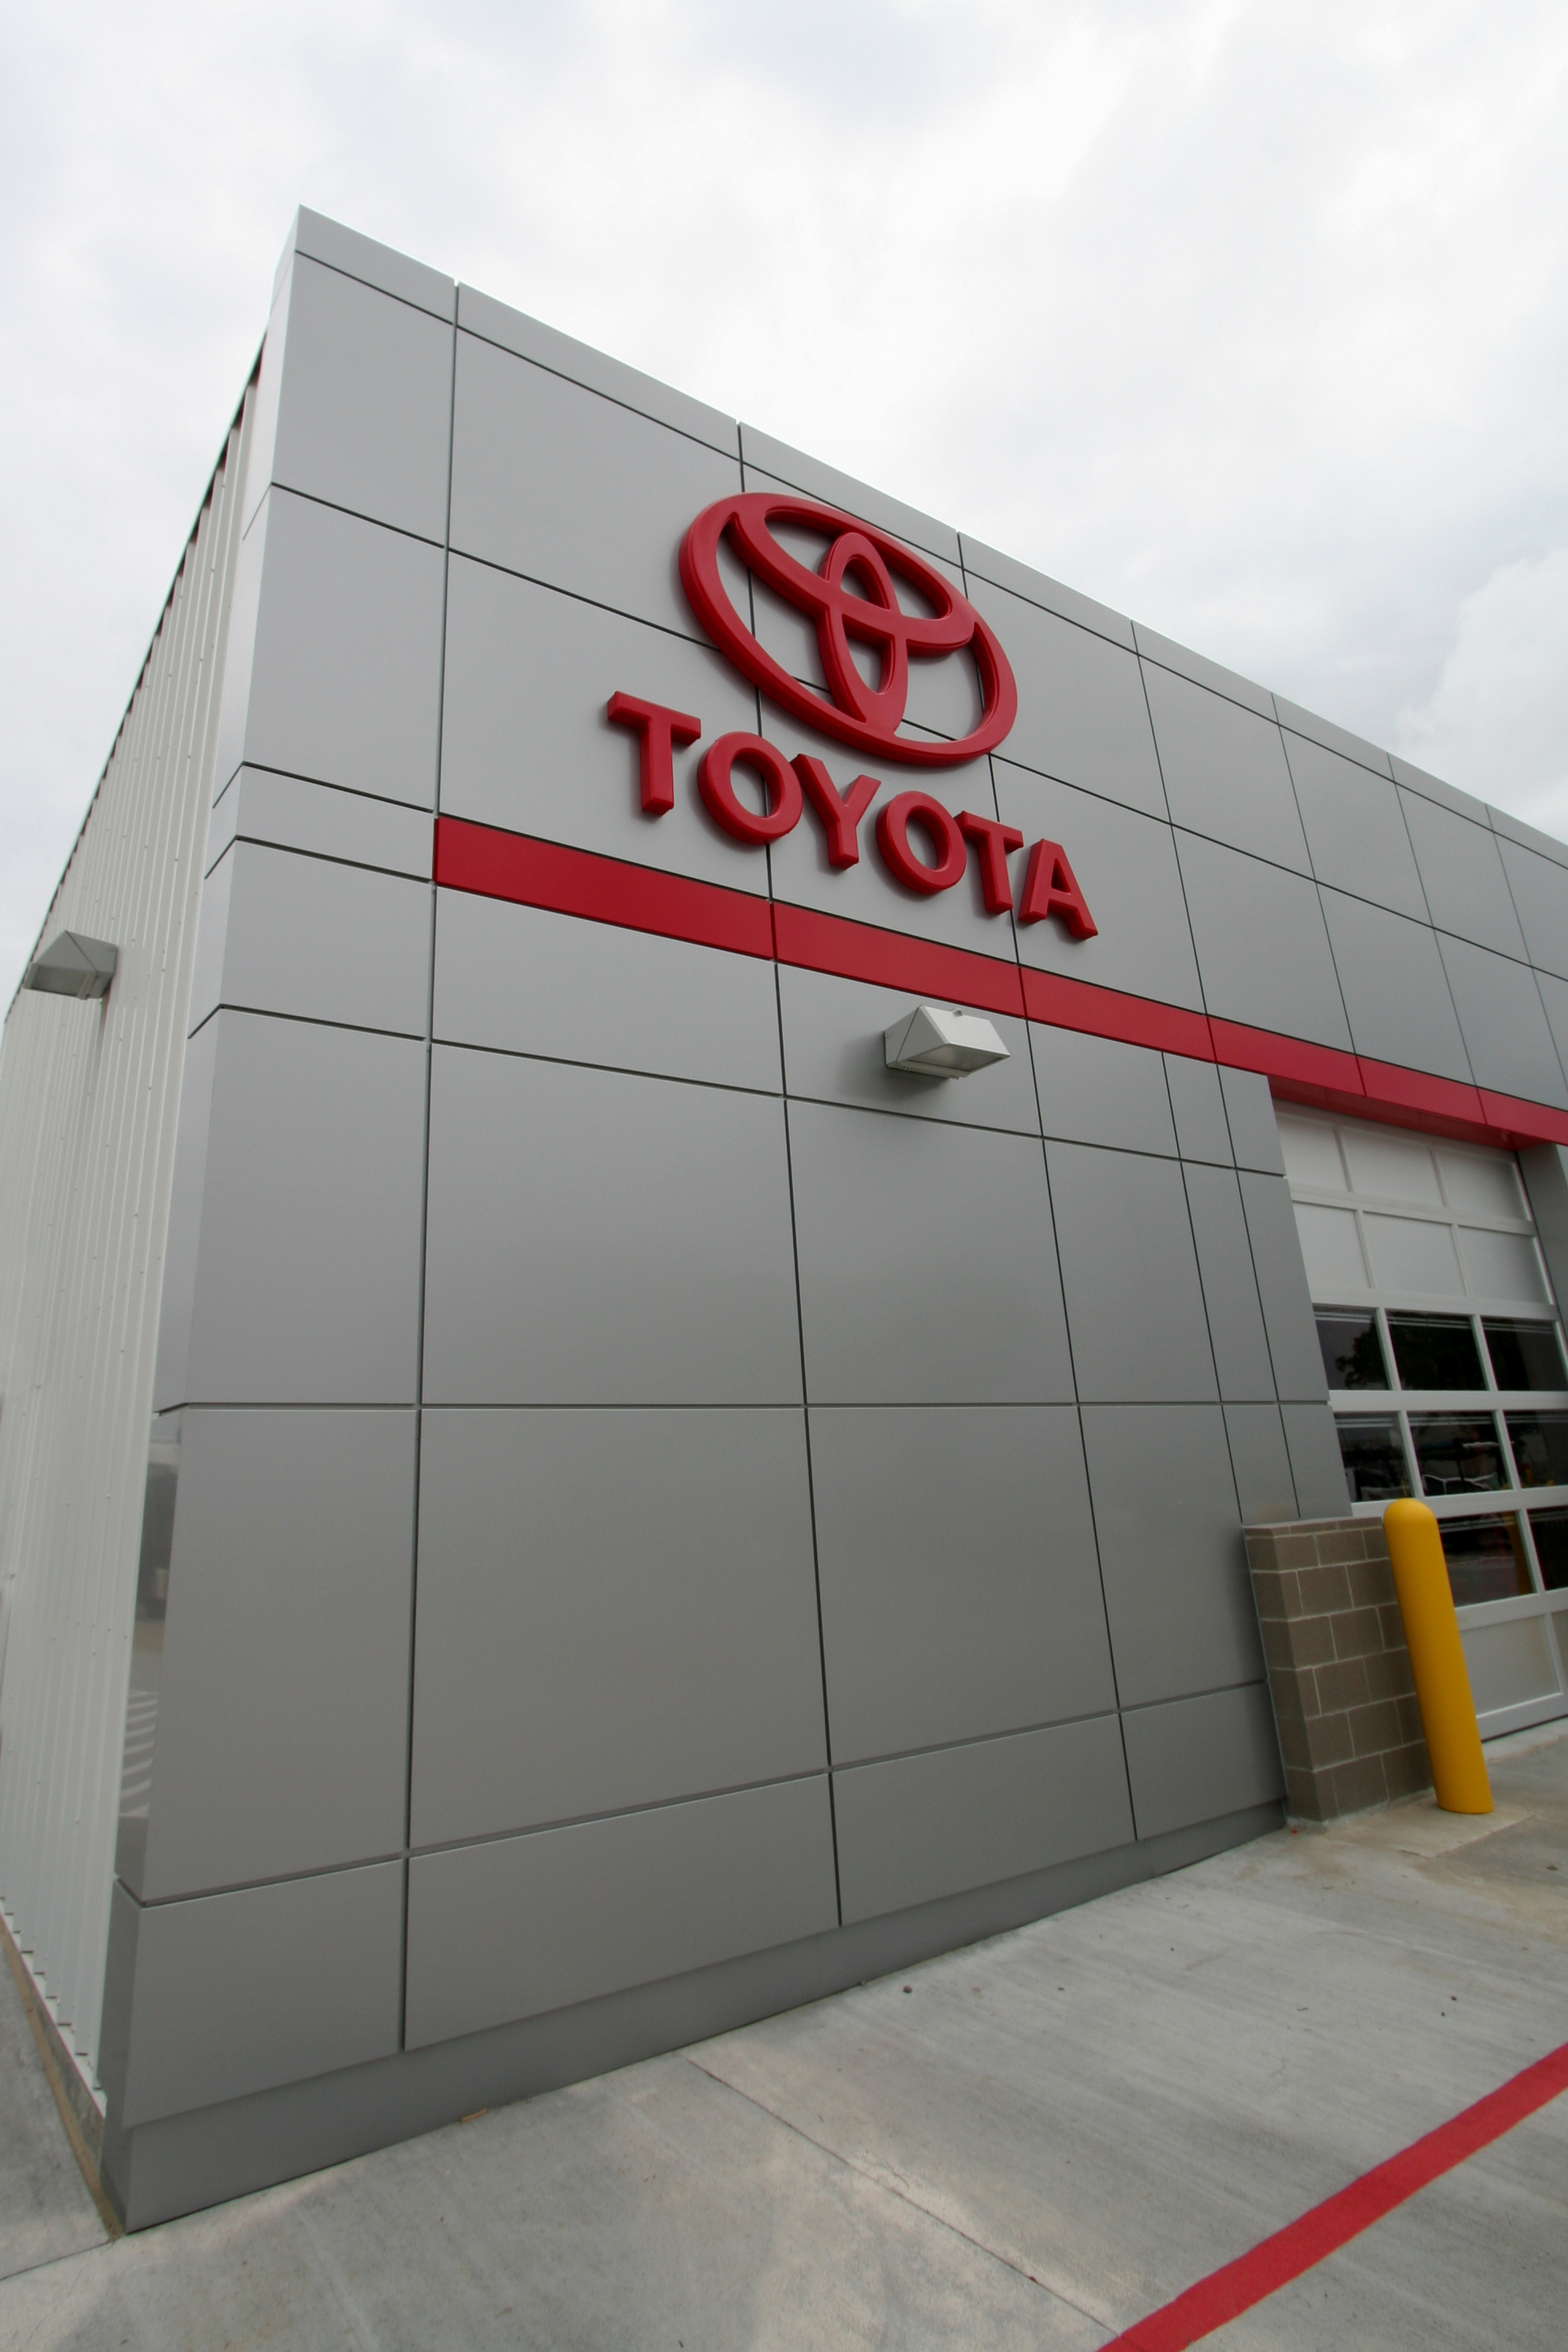 MH Toyota Express_Exterior_02.jpg